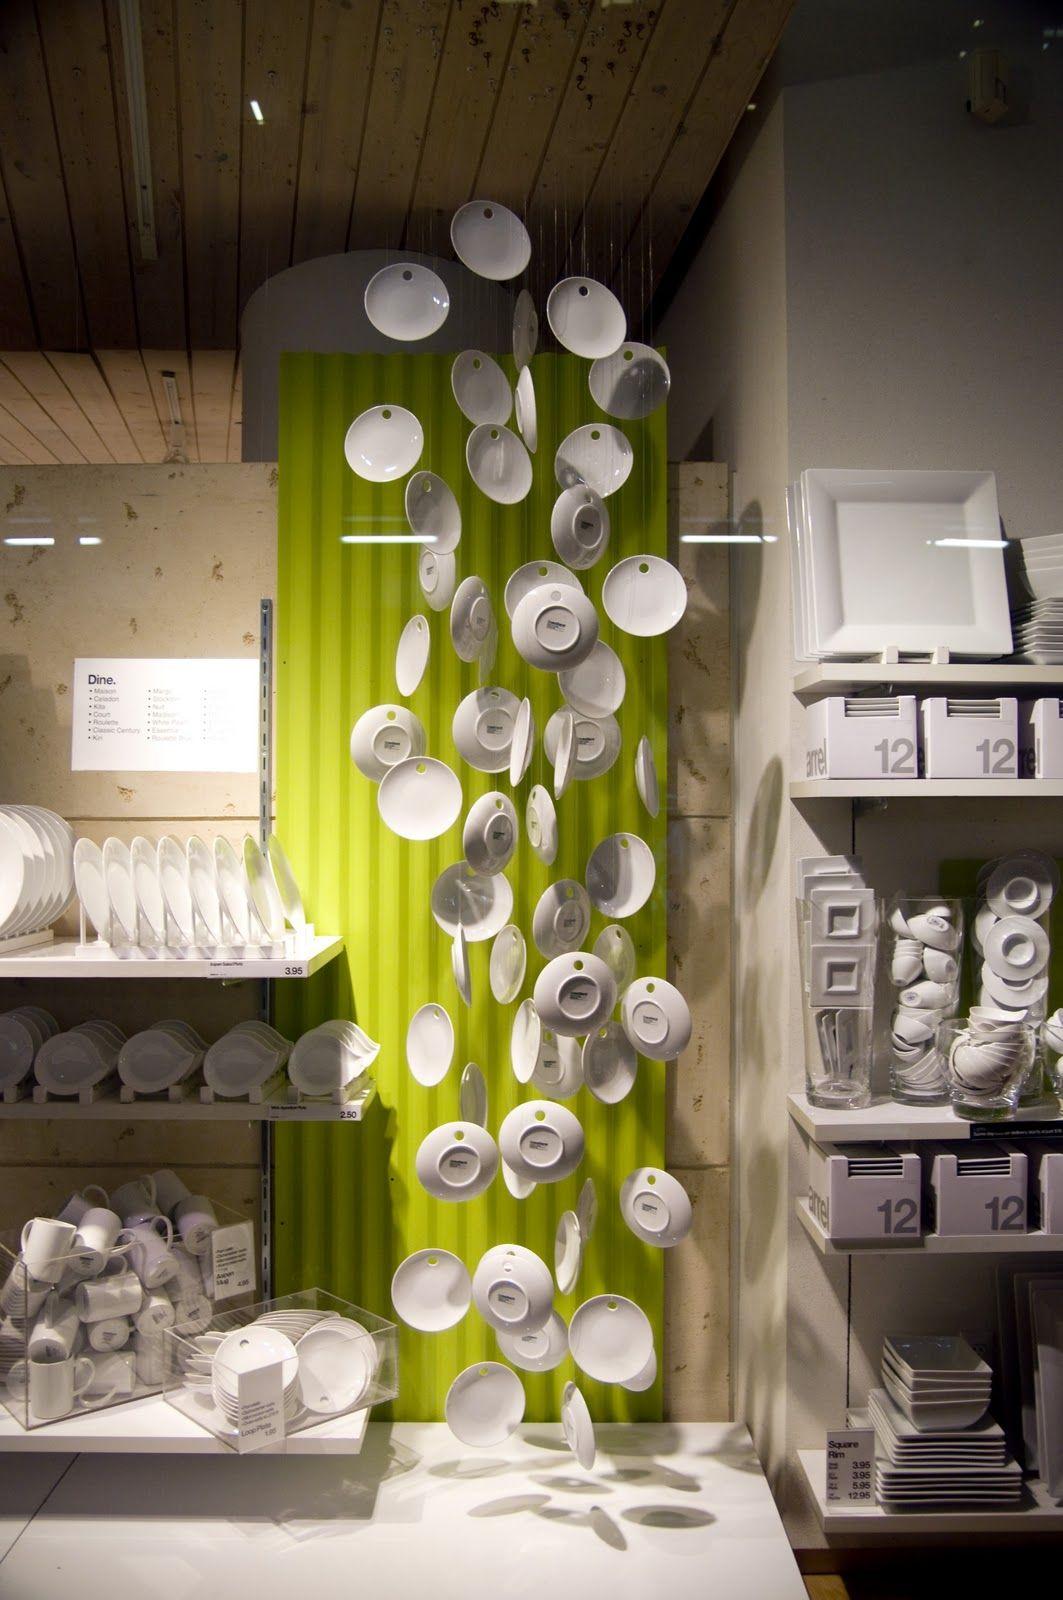 crate barrel instore pinned by ton van der veer inspiration stores in 2019 visual. Black Bedroom Furniture Sets. Home Design Ideas